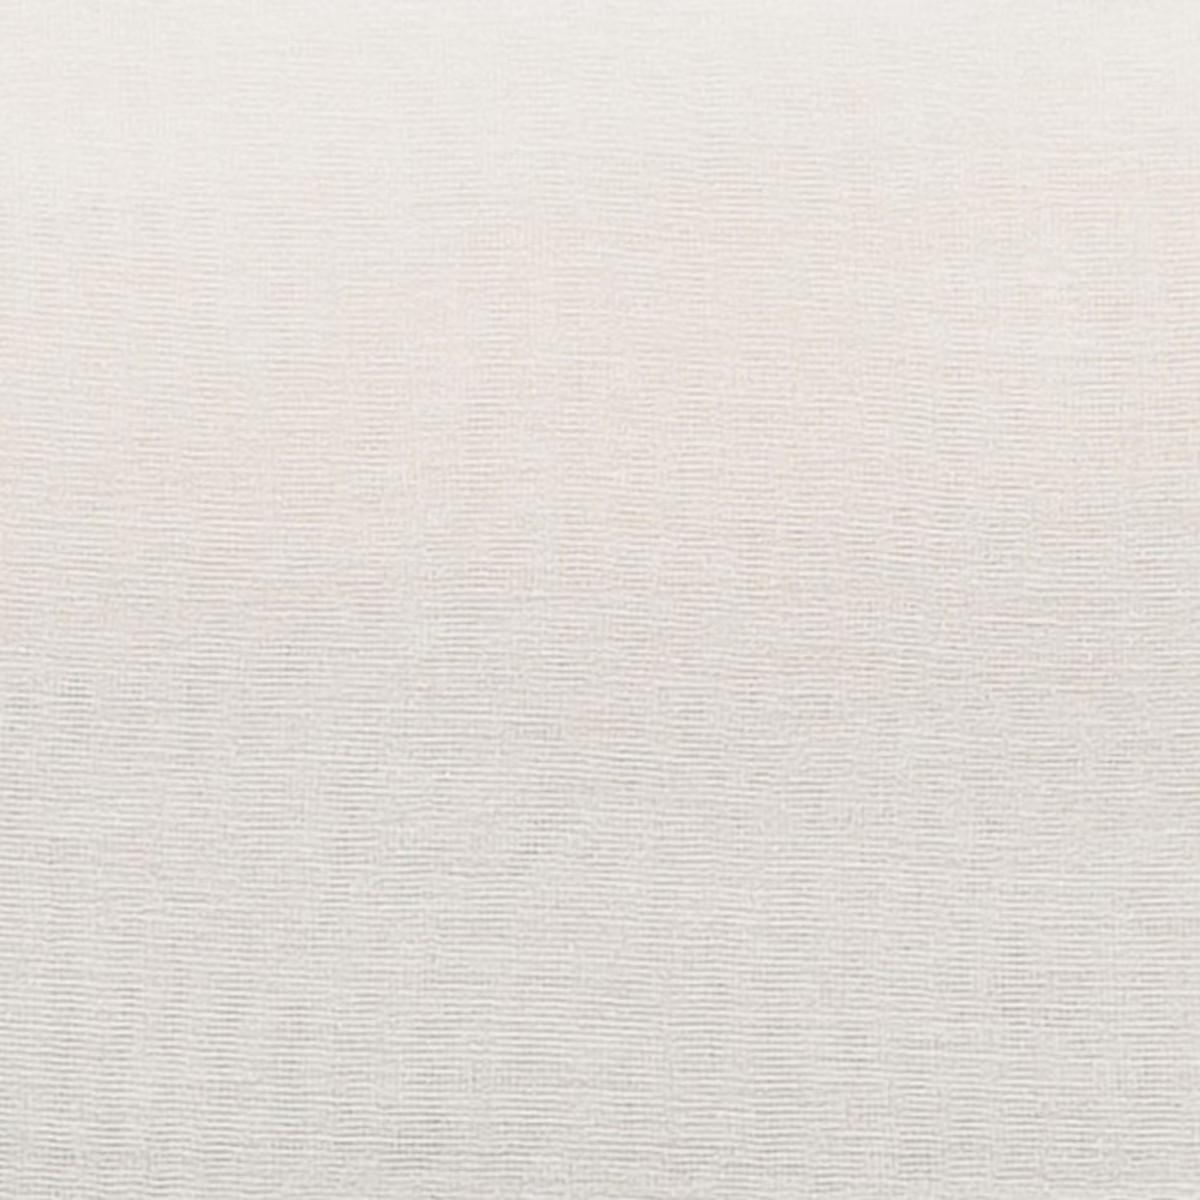 Тюль 1 п/м 300 см органза однотон цвет молочный